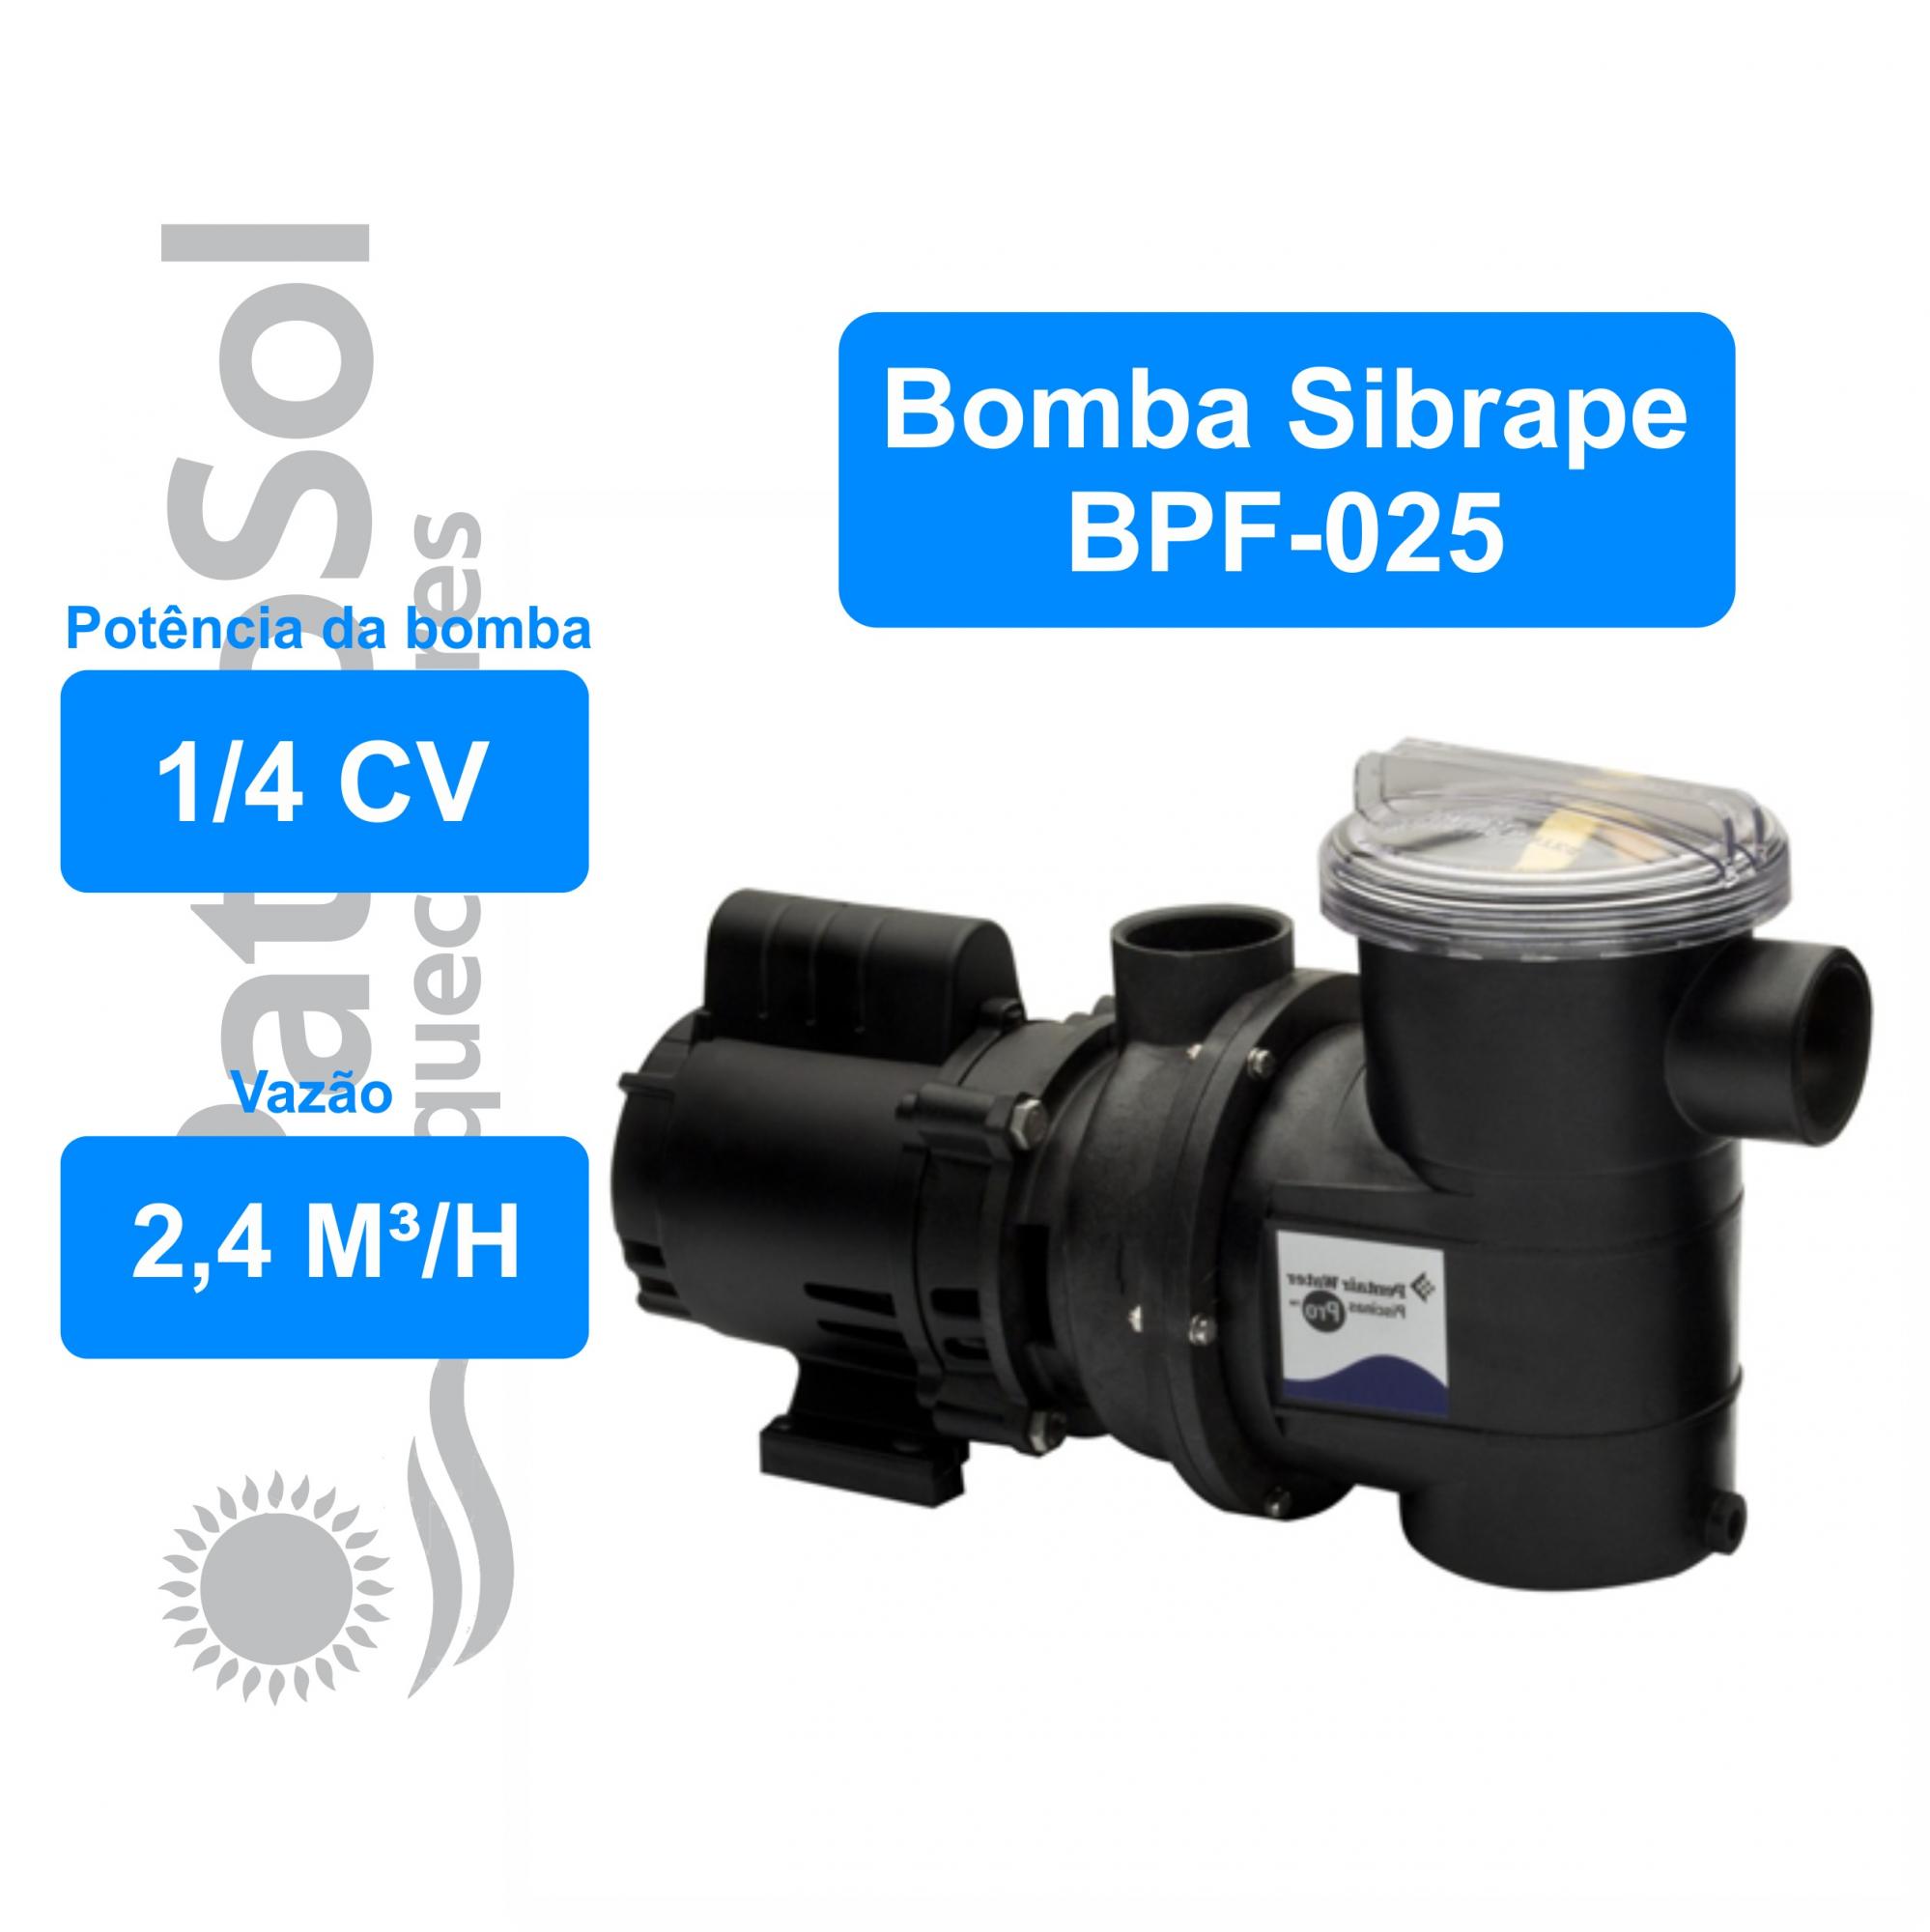 Moto Bomba Para Piscina Sibrape 1/4 Cv - Motor Weg 110/220 Volts